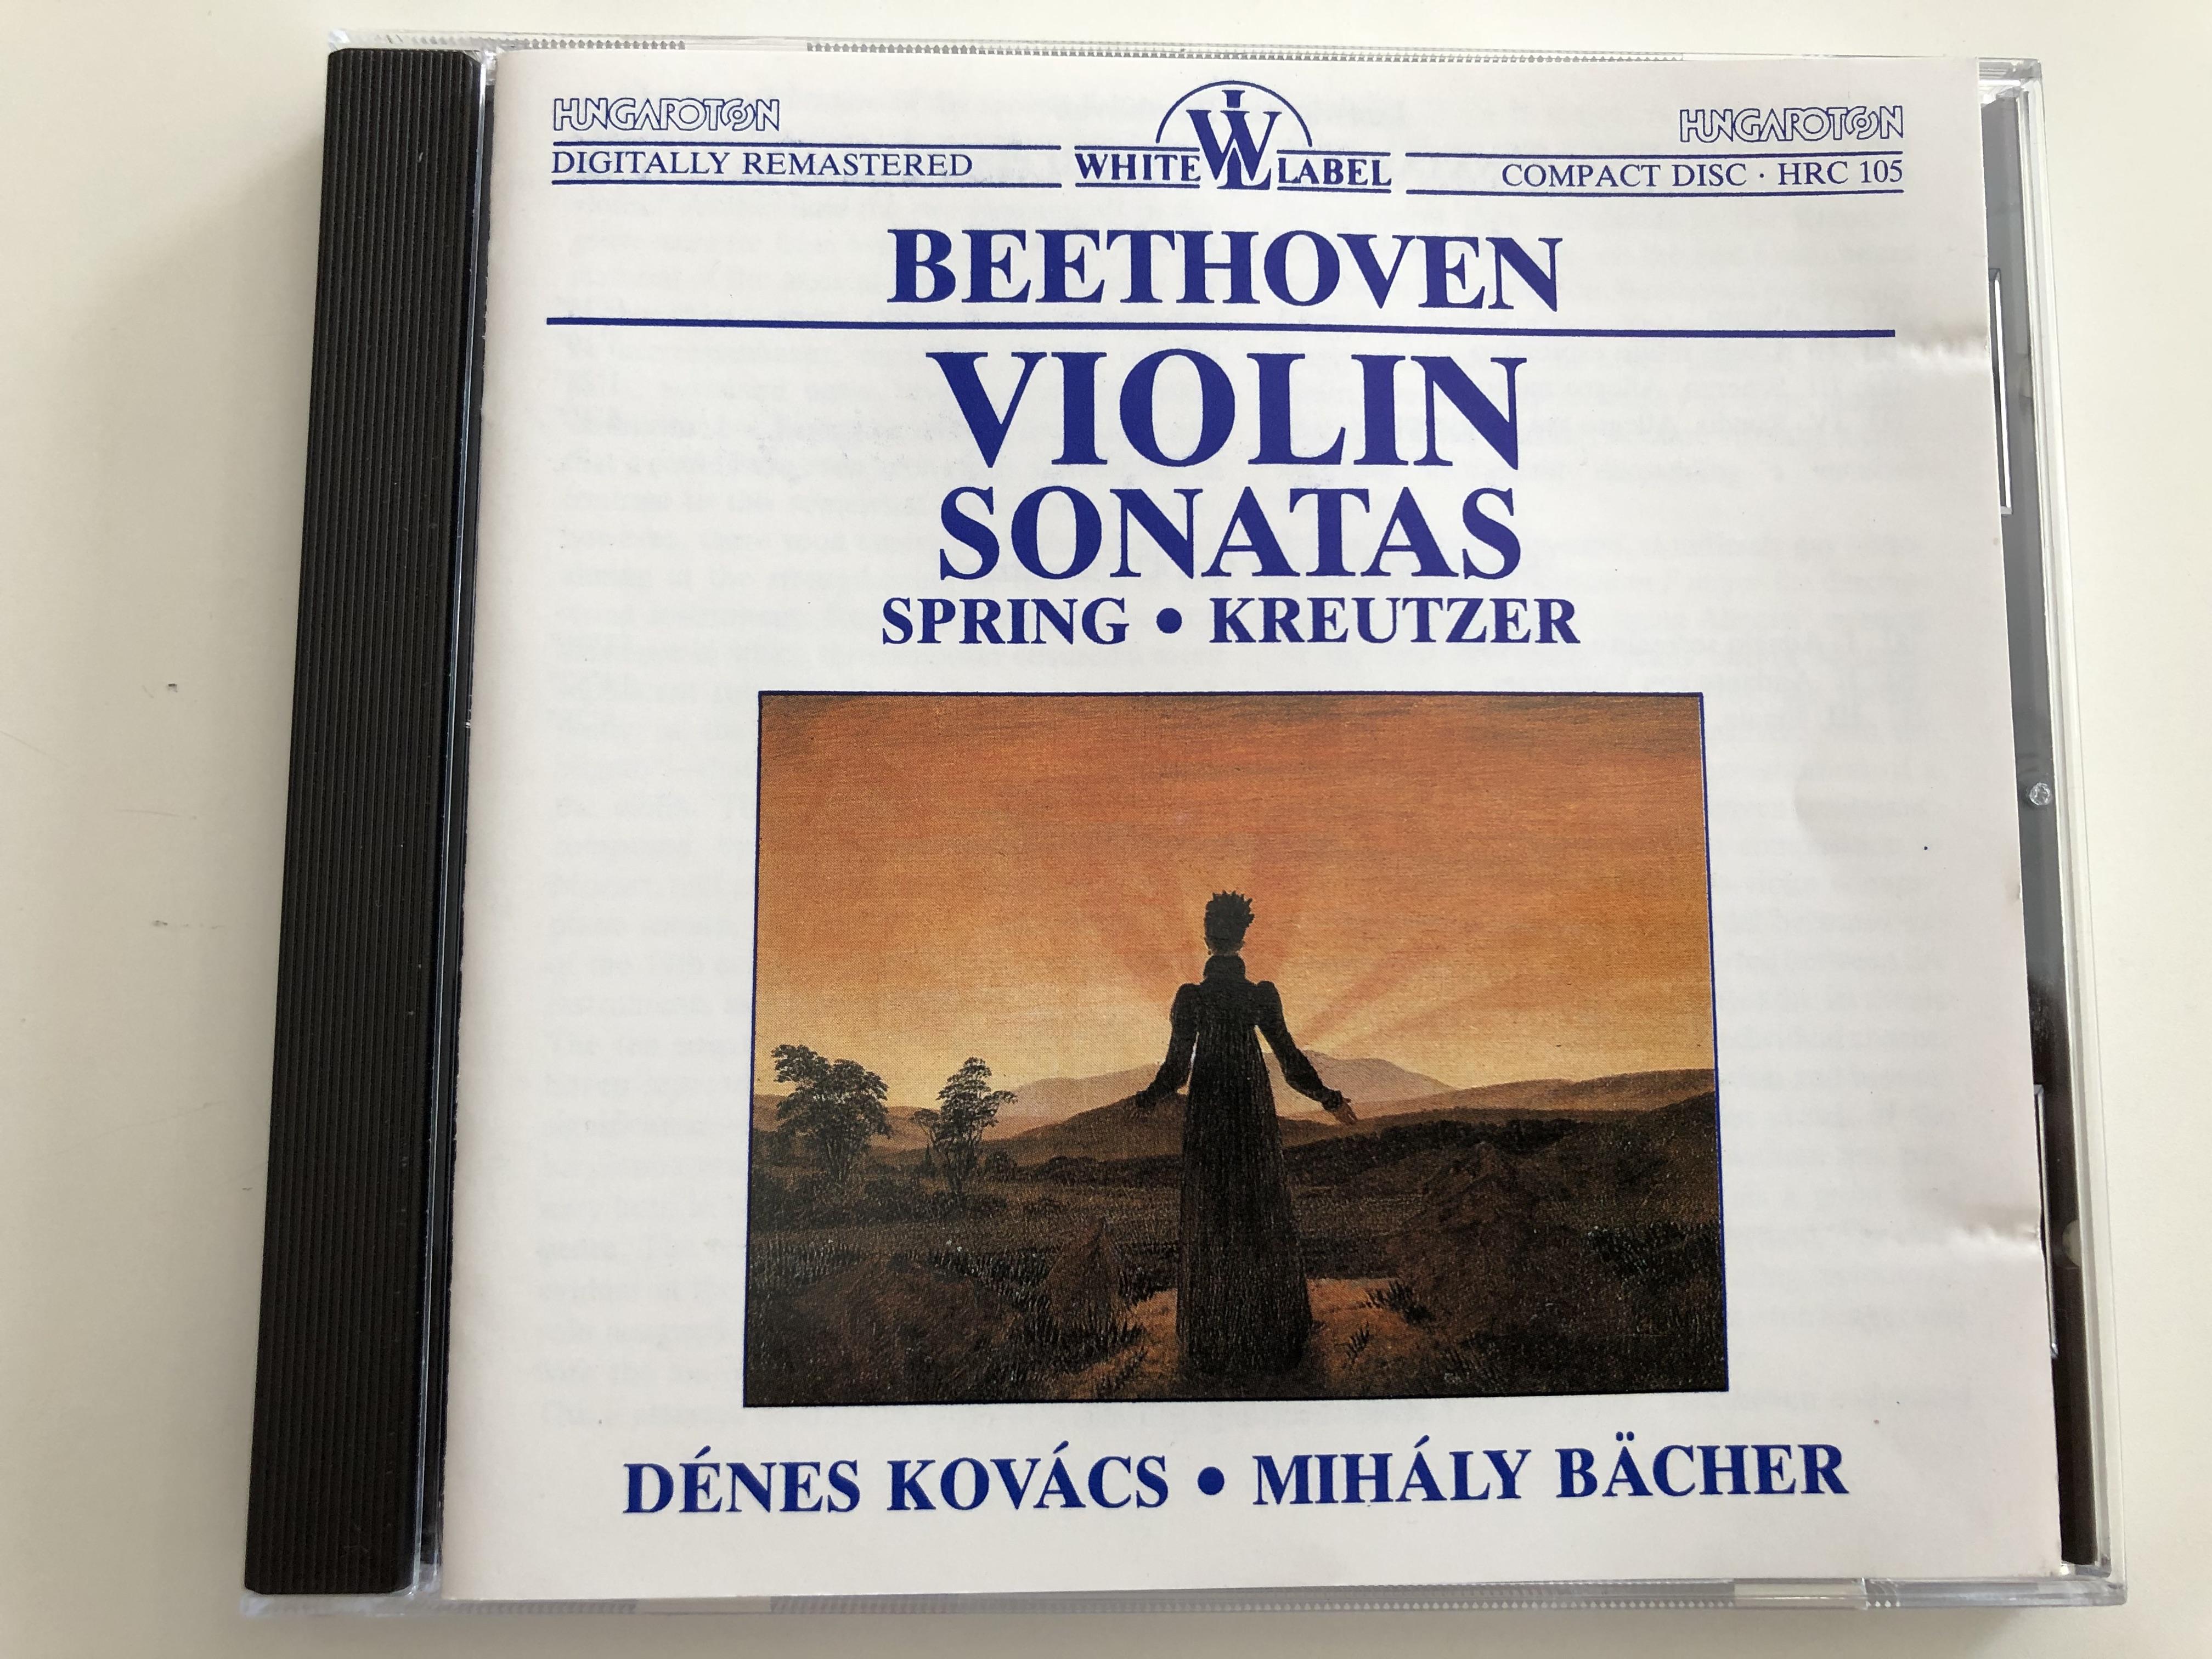 beethoven-violin-sonatas-spring-kreutzer-d-nes-kov-cs-mih-ly-b-cher-hungaroton-white-label-hrc-105-audio-cd-1988-1-.jpg